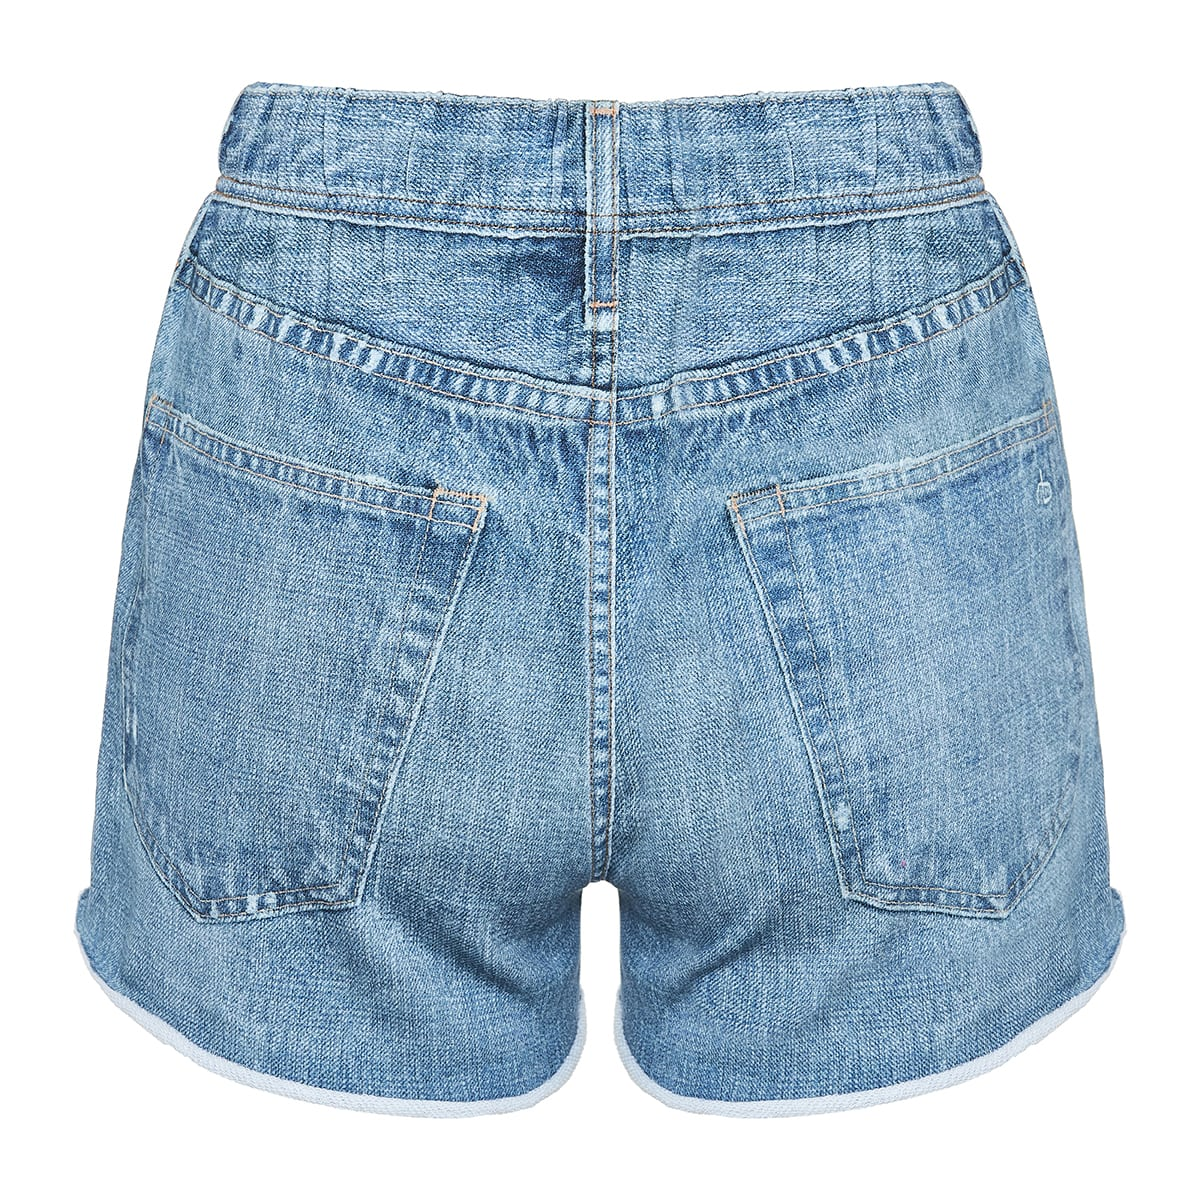 Miramar denim-effect track shorts